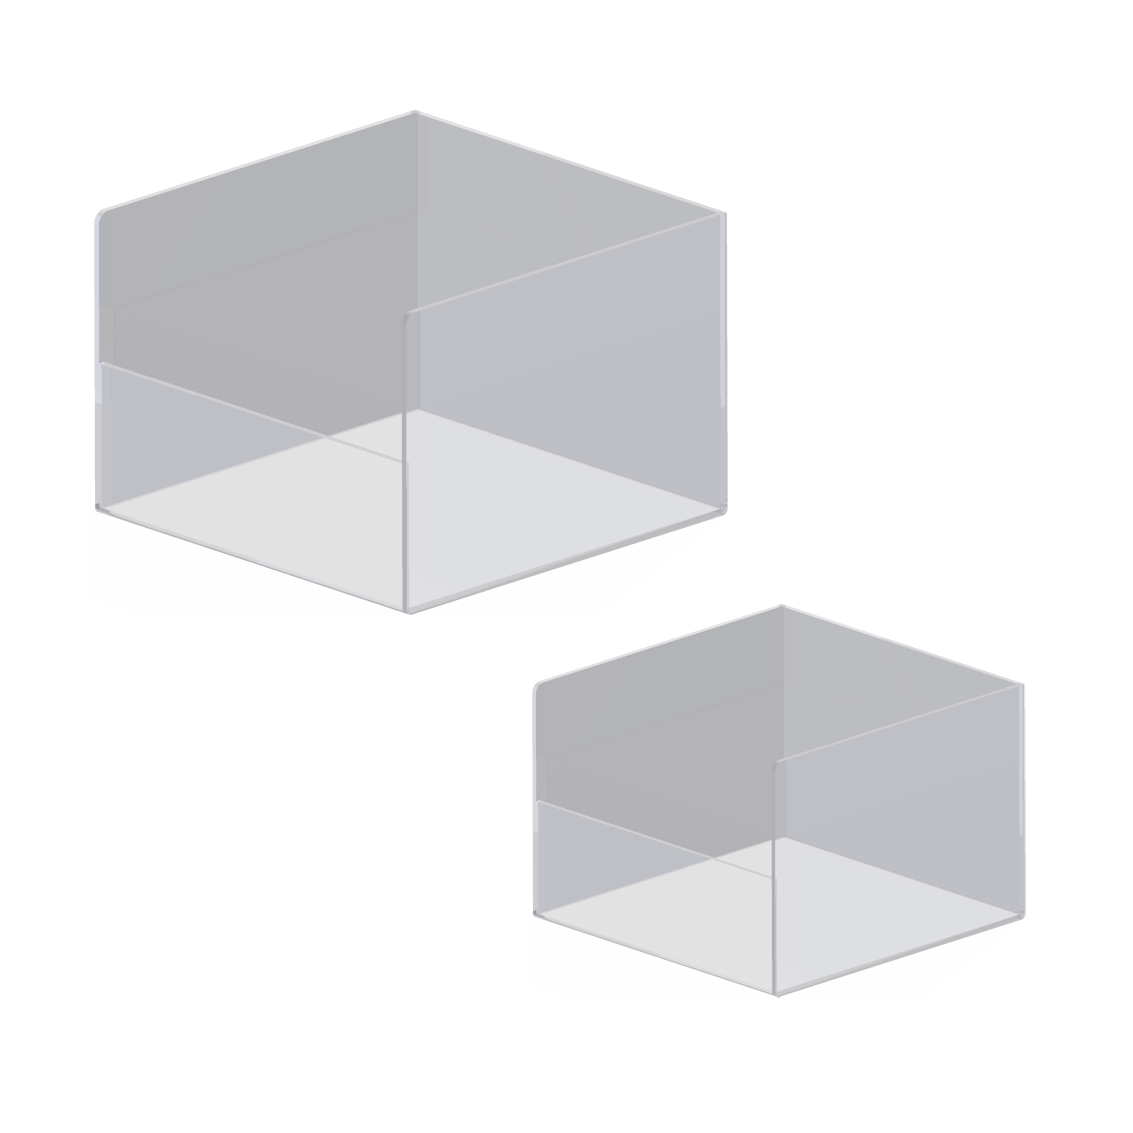 Akryl Box 3e design ab - akryl box med låg framtkant